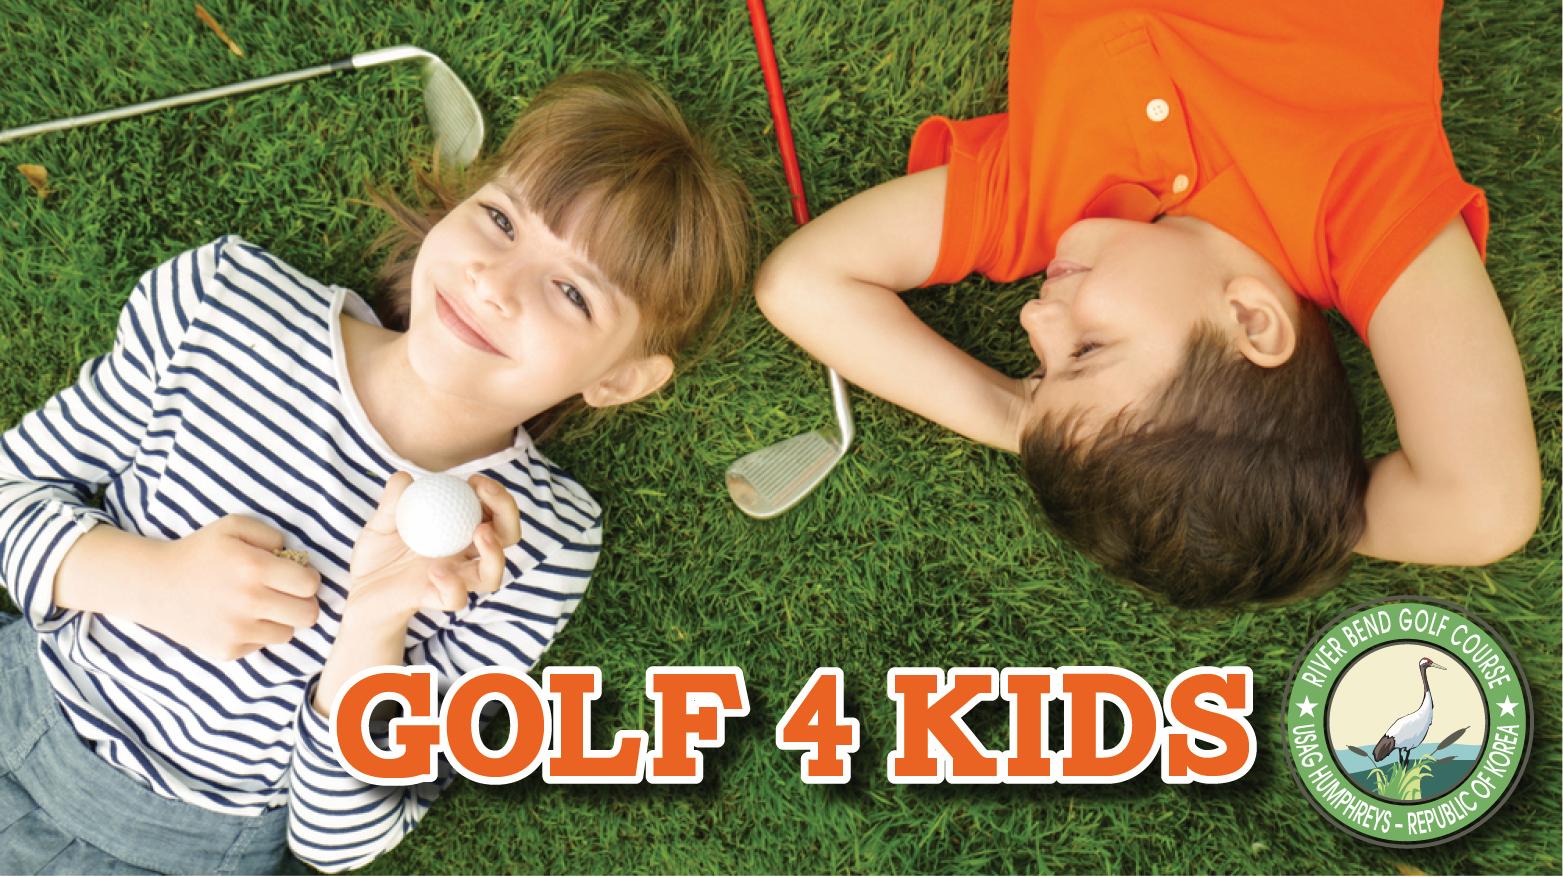 Golf 4 Kids